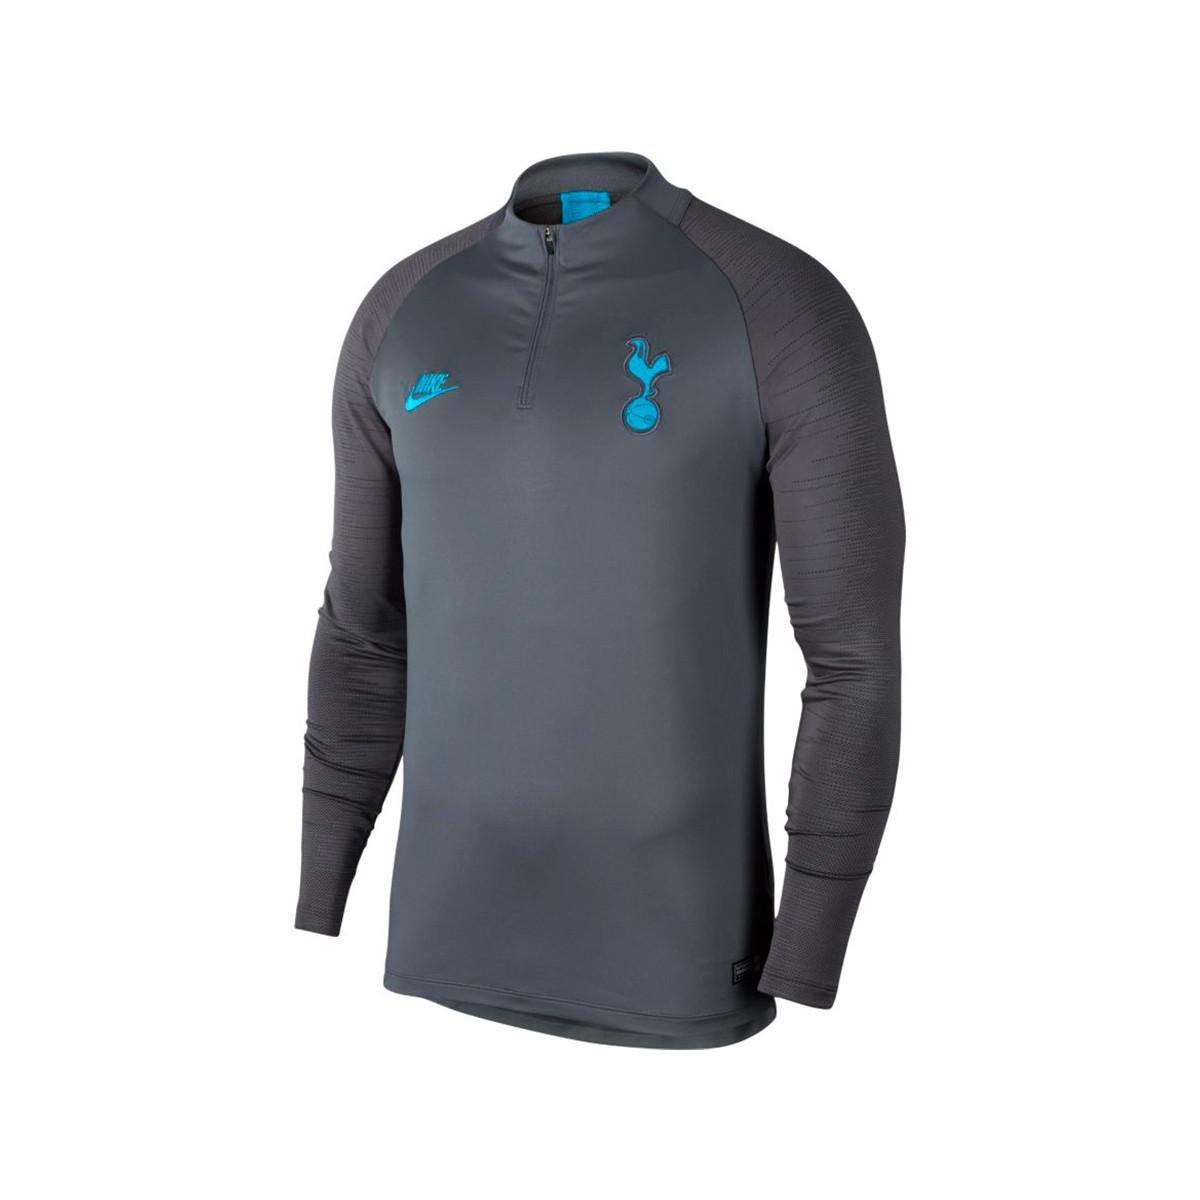 Sweatshirt Nike Tottenham Hotspur Dry Strike Dril Top 2019 2020 Flint Grey Dark Grey Blue Fury Football Store Futbol Emotion